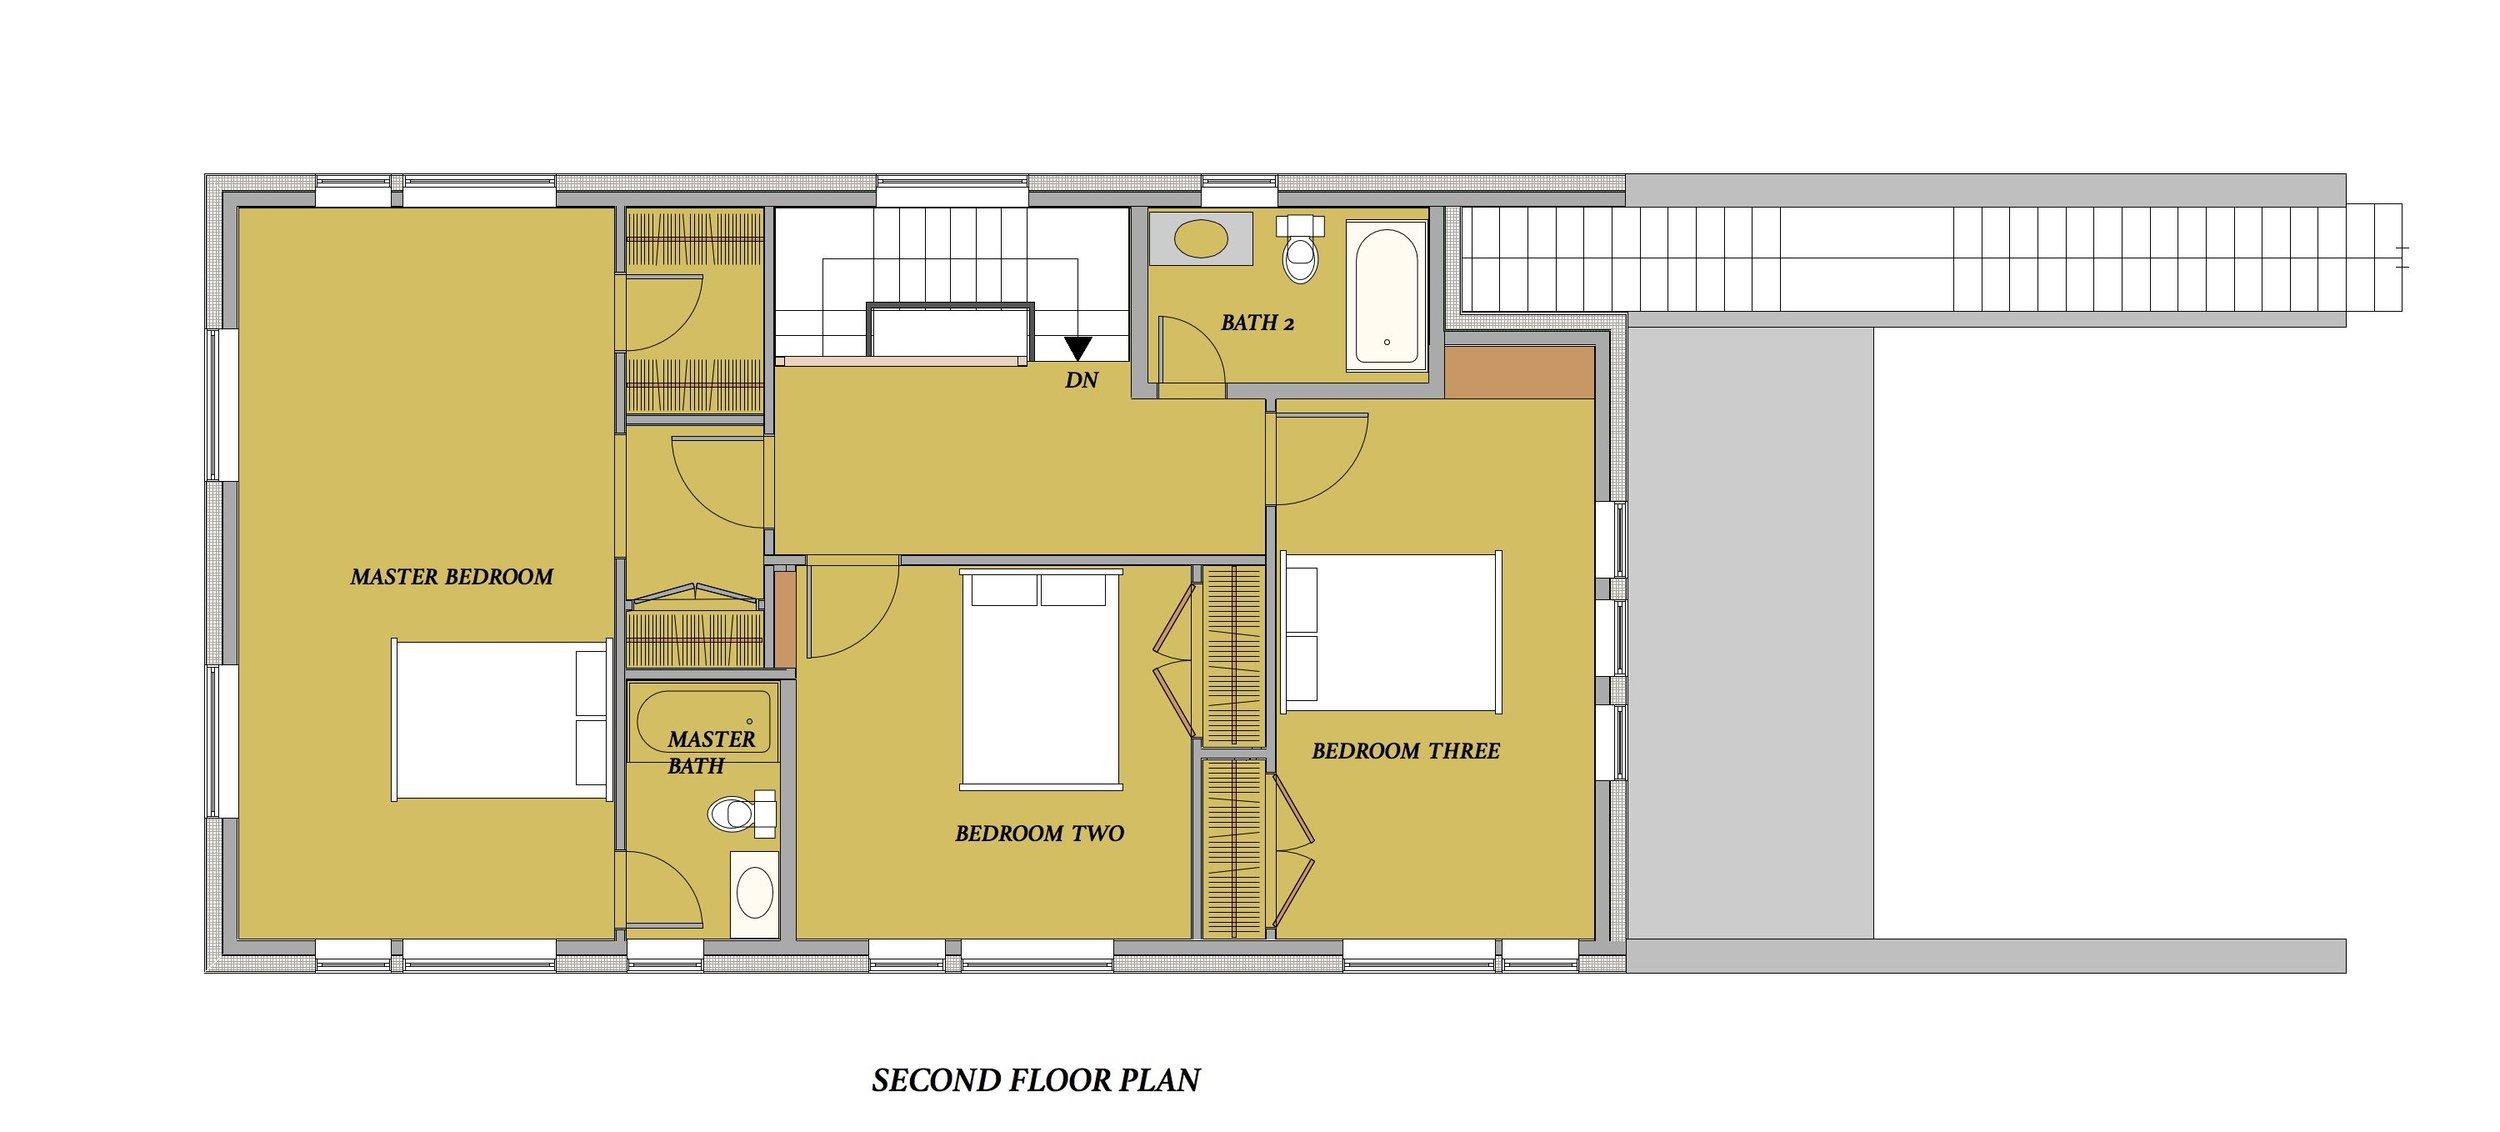 MODERN HOUSE 2 SECOND FLOOR PLAN.jpg